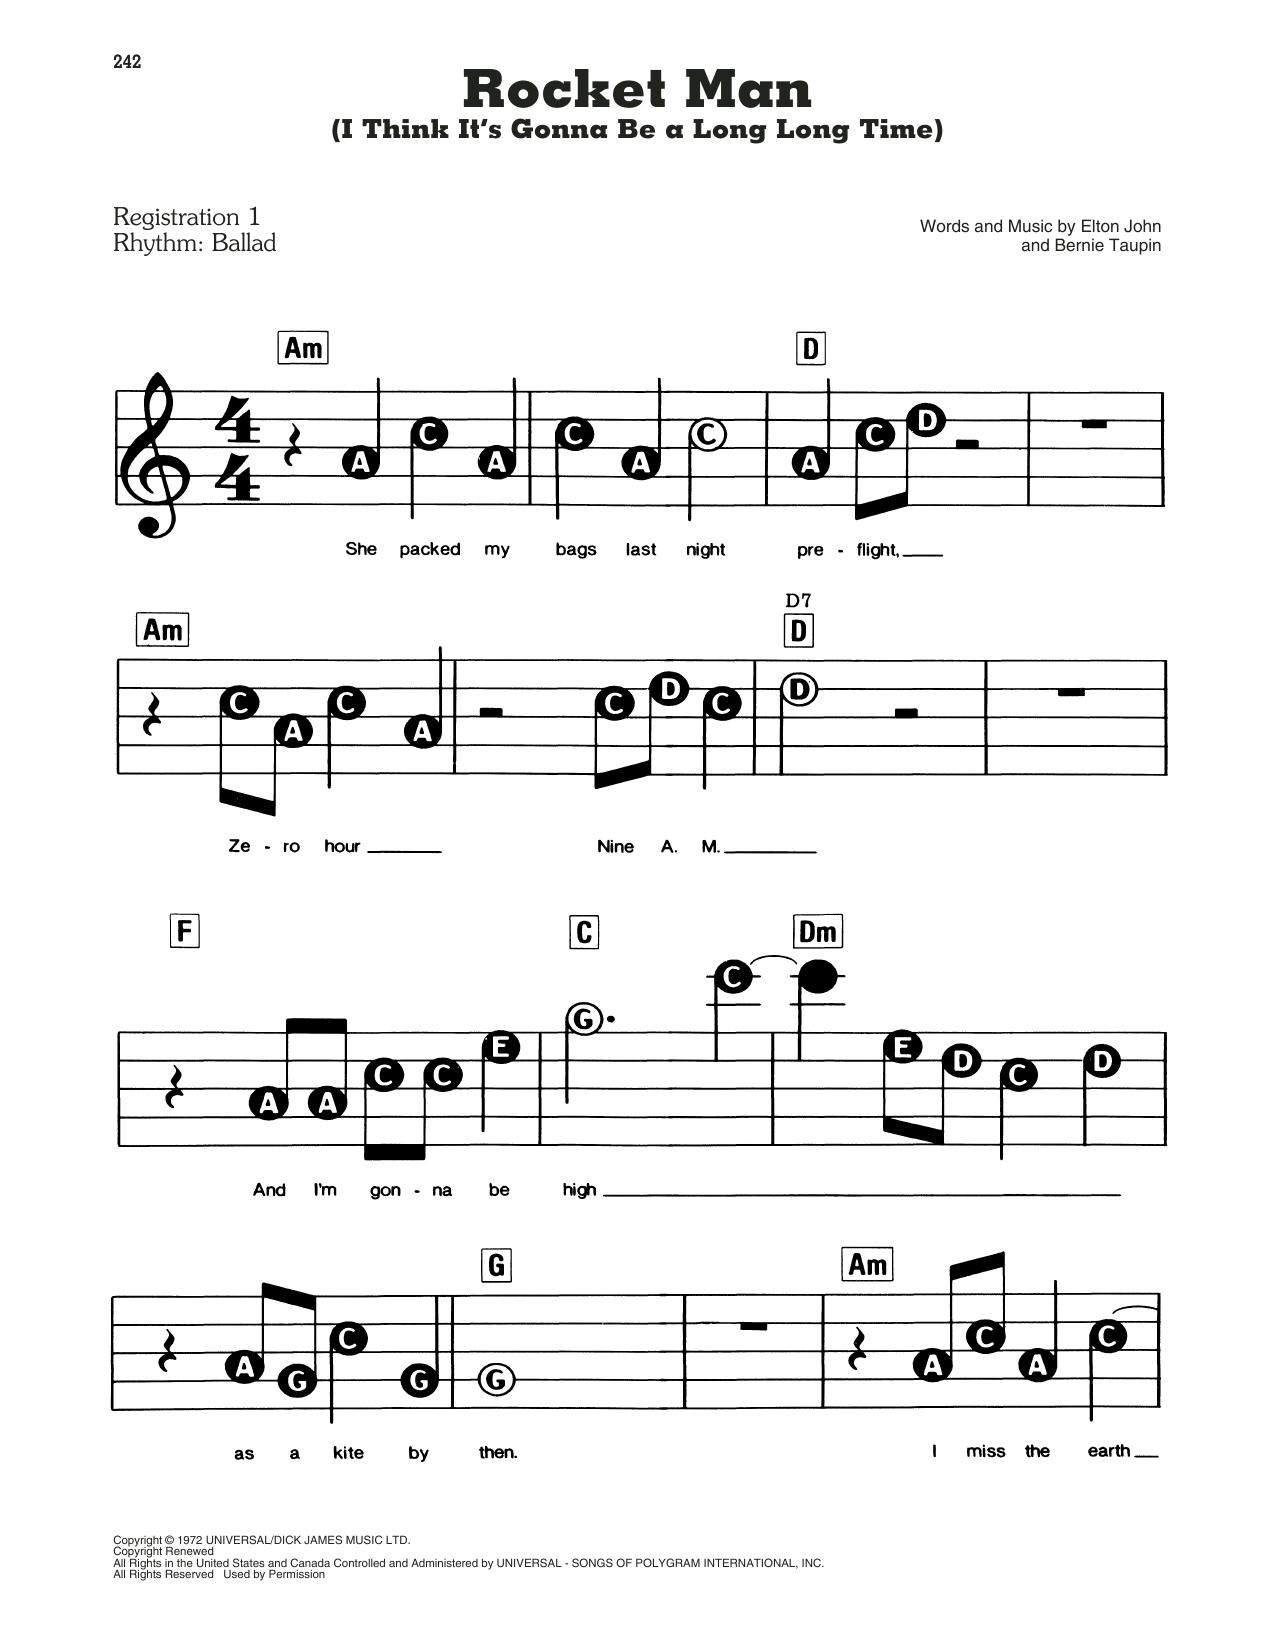 Rocket Man (I Think It's Gonna Be A Long Long Time) Sheet Music